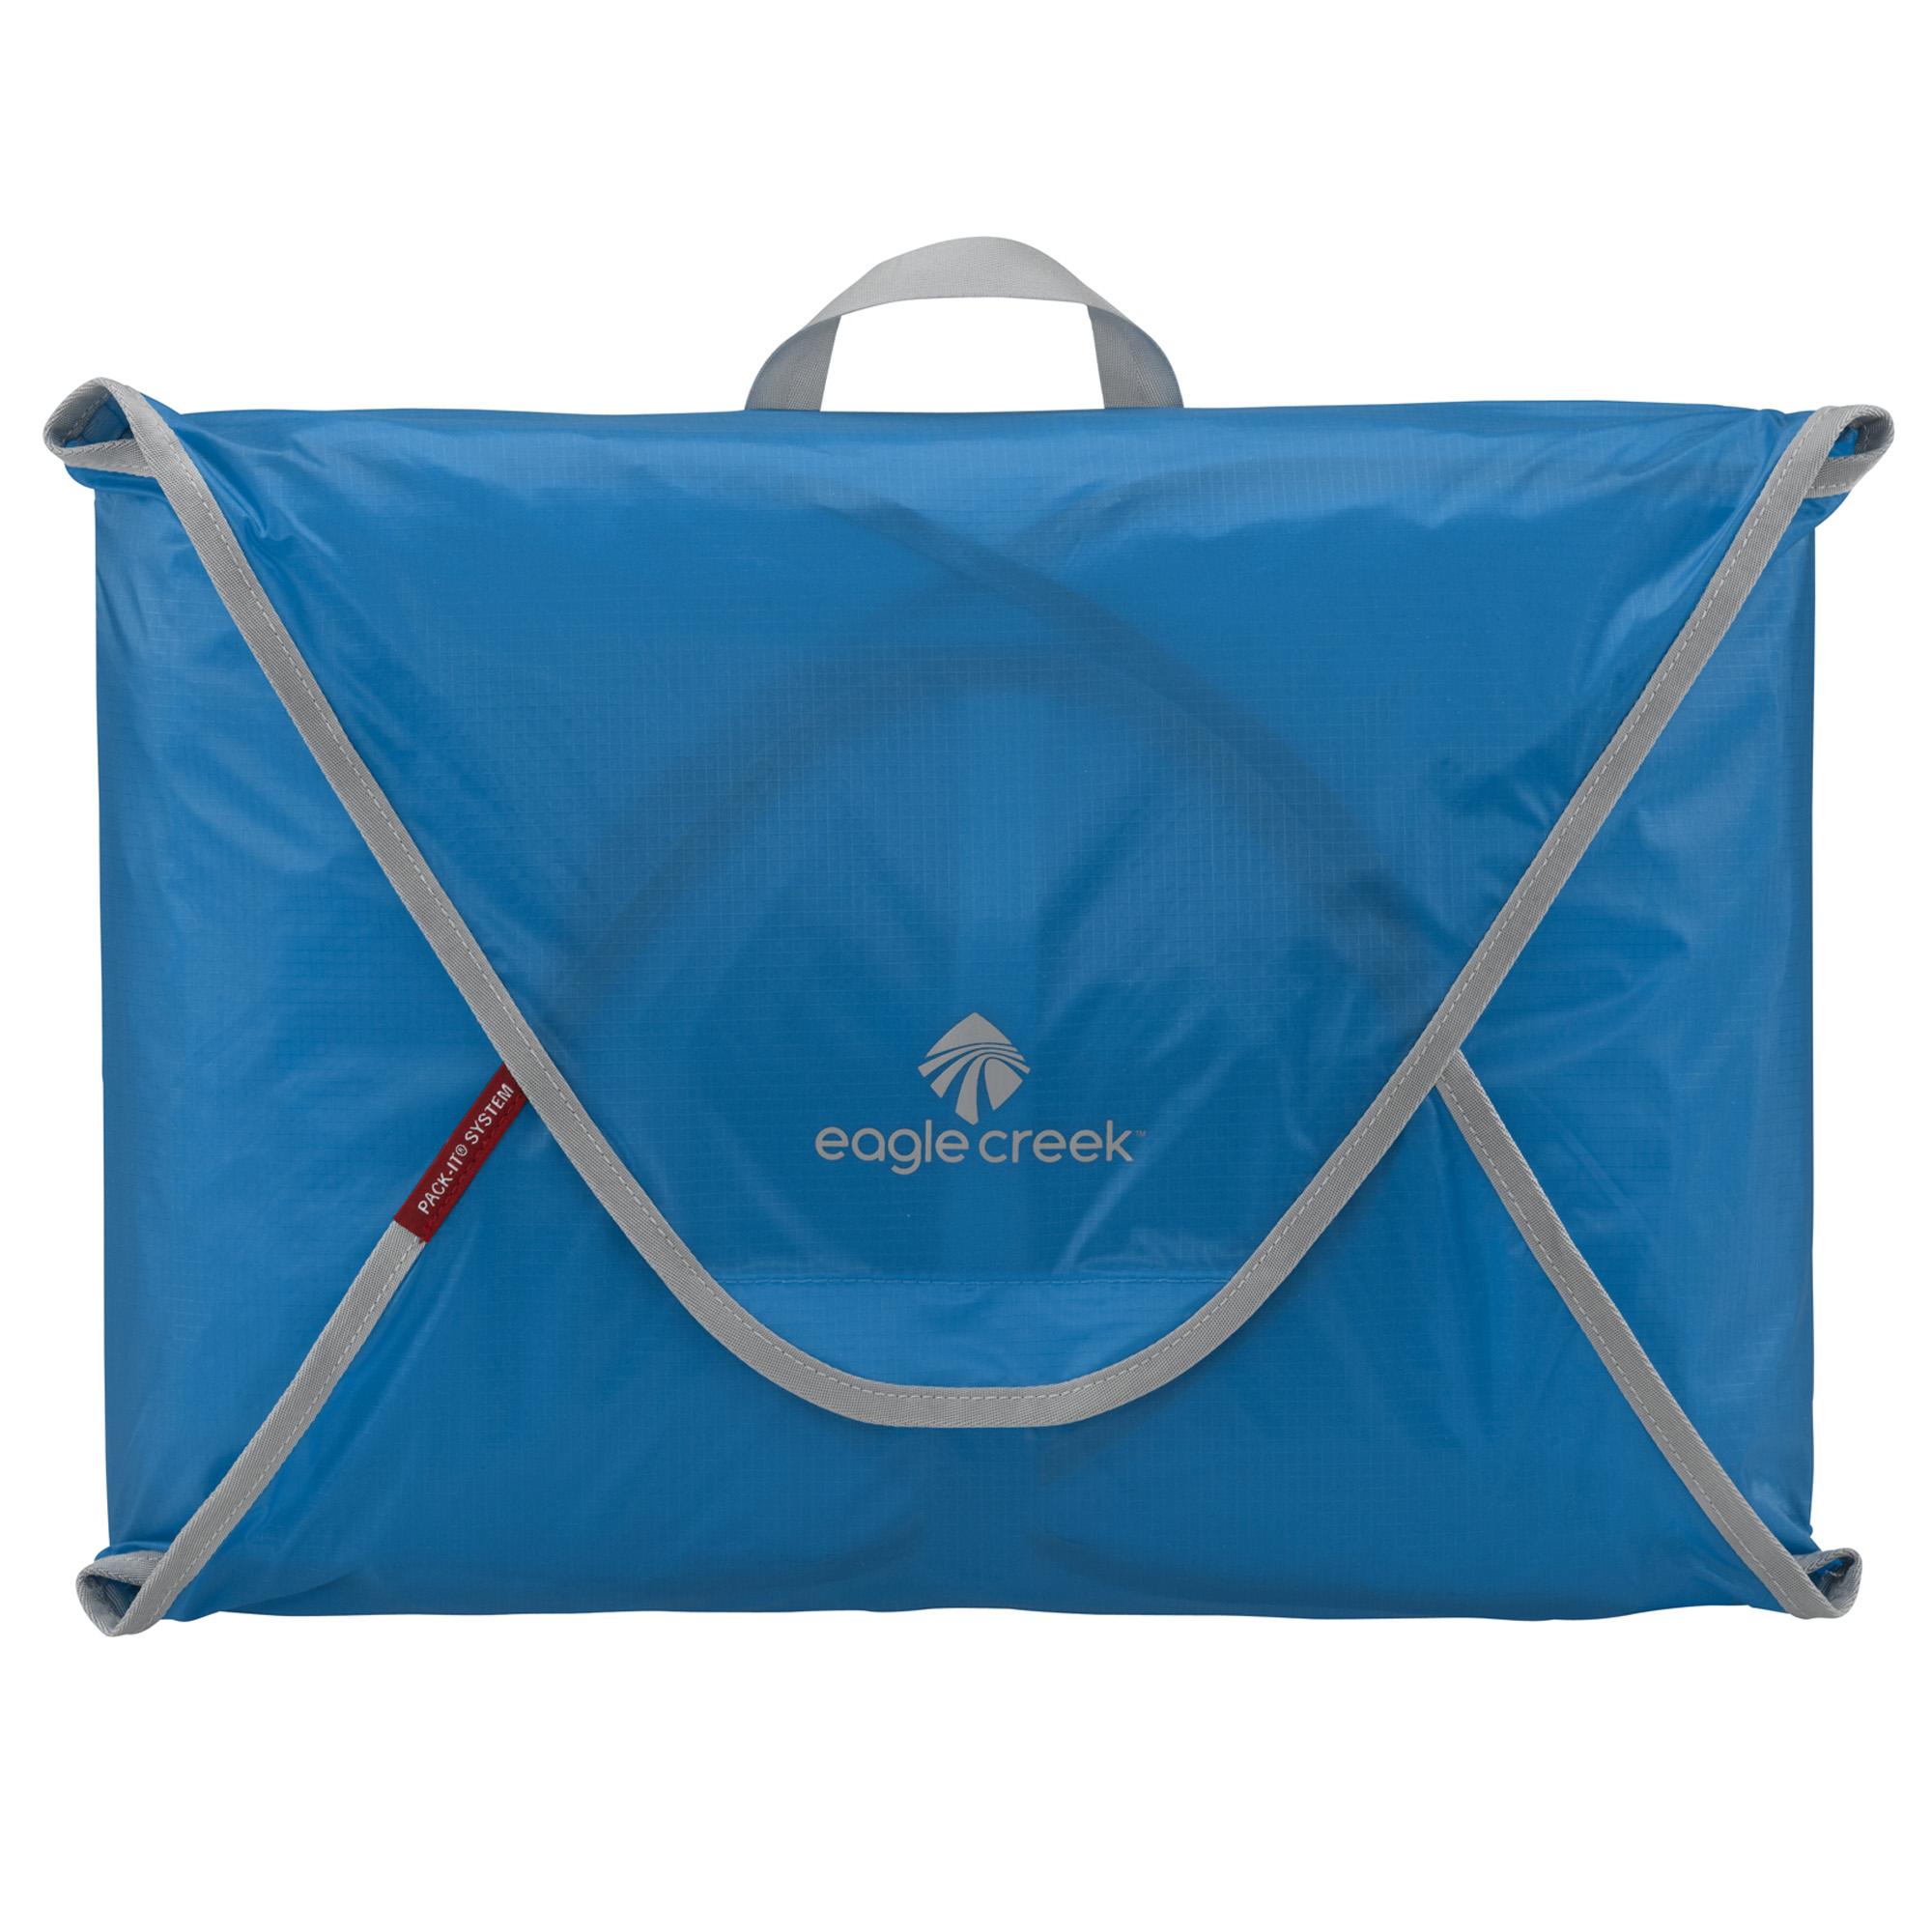 Pack-It Specter Garment Folder Medium - Brilliant Blue